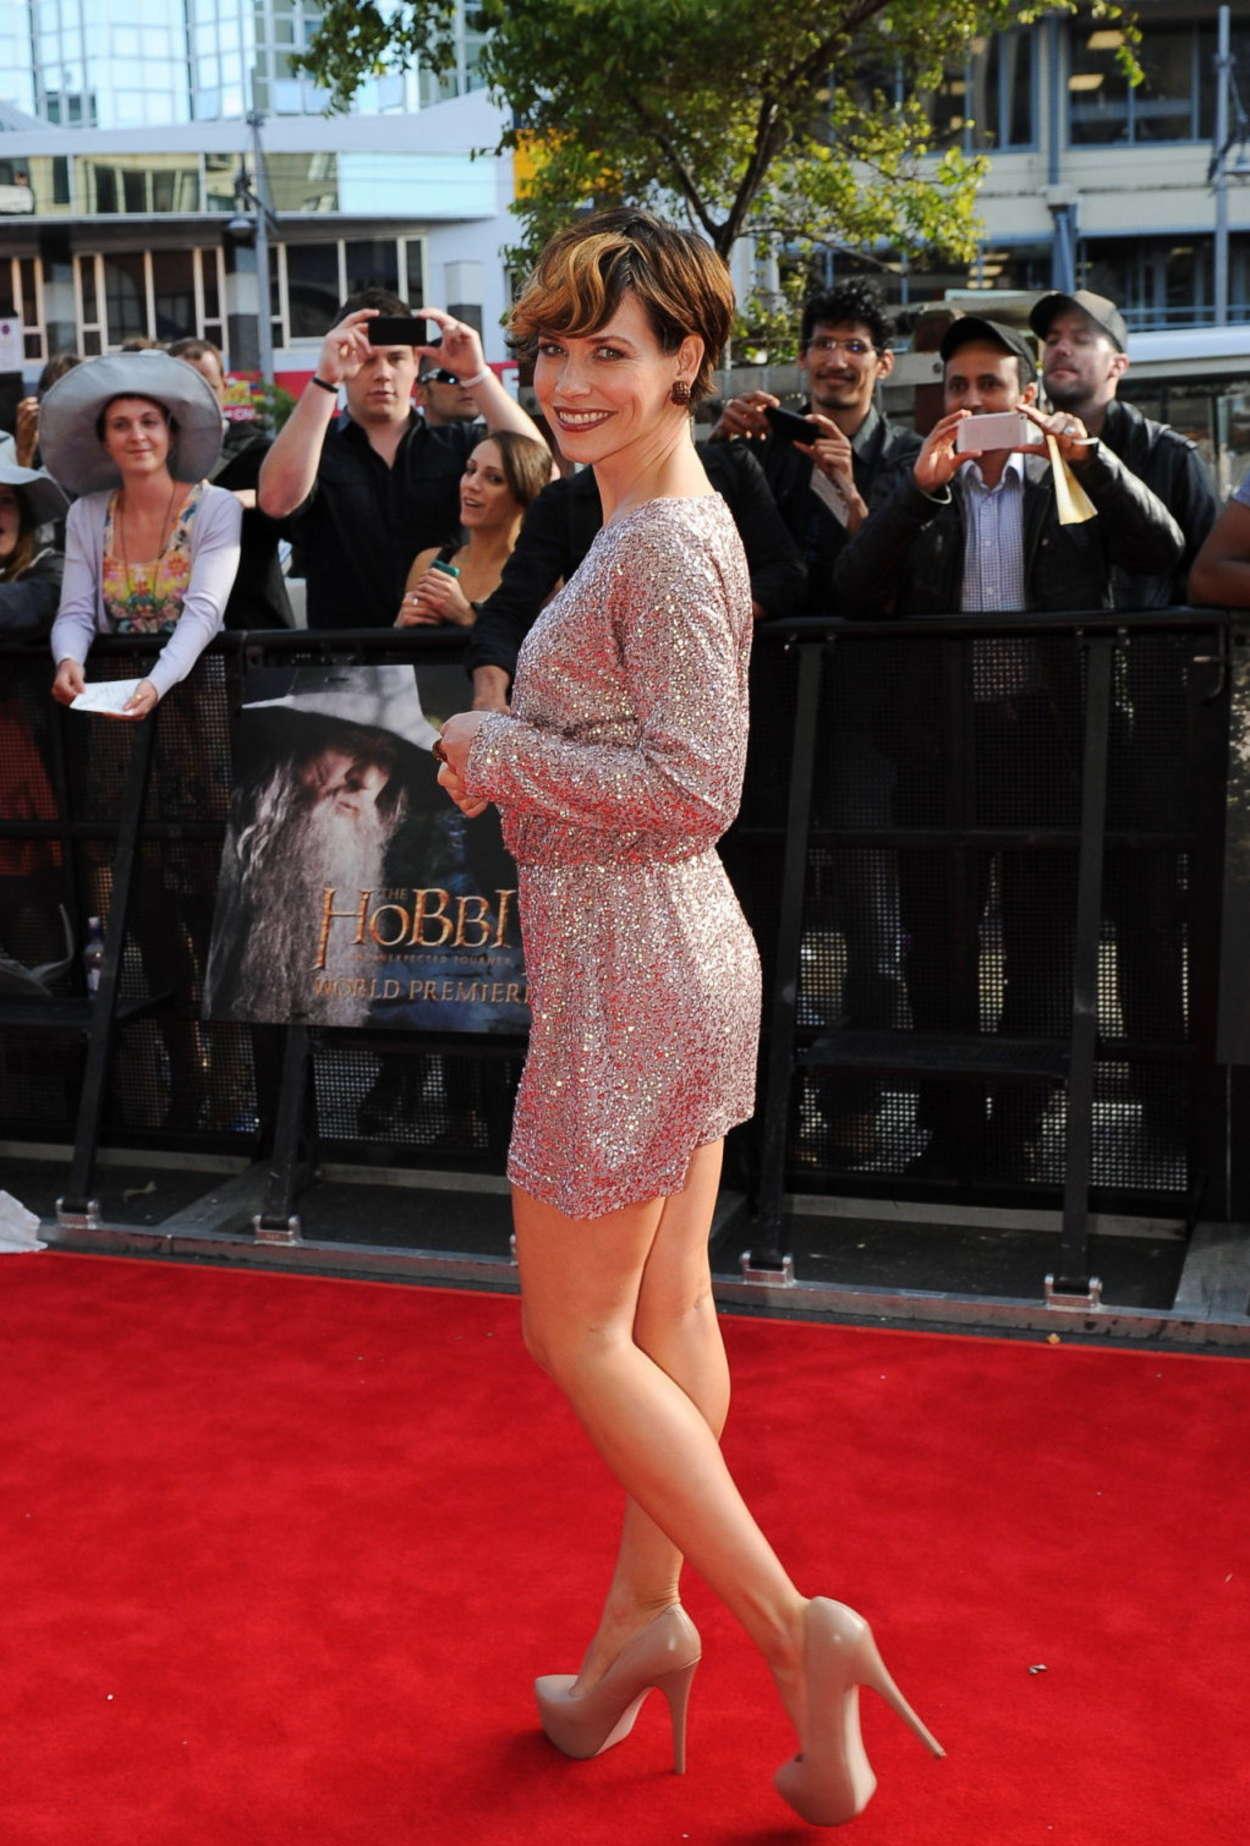 Evangeline Lilly Hot In Dress At Hobbit Premiere 03